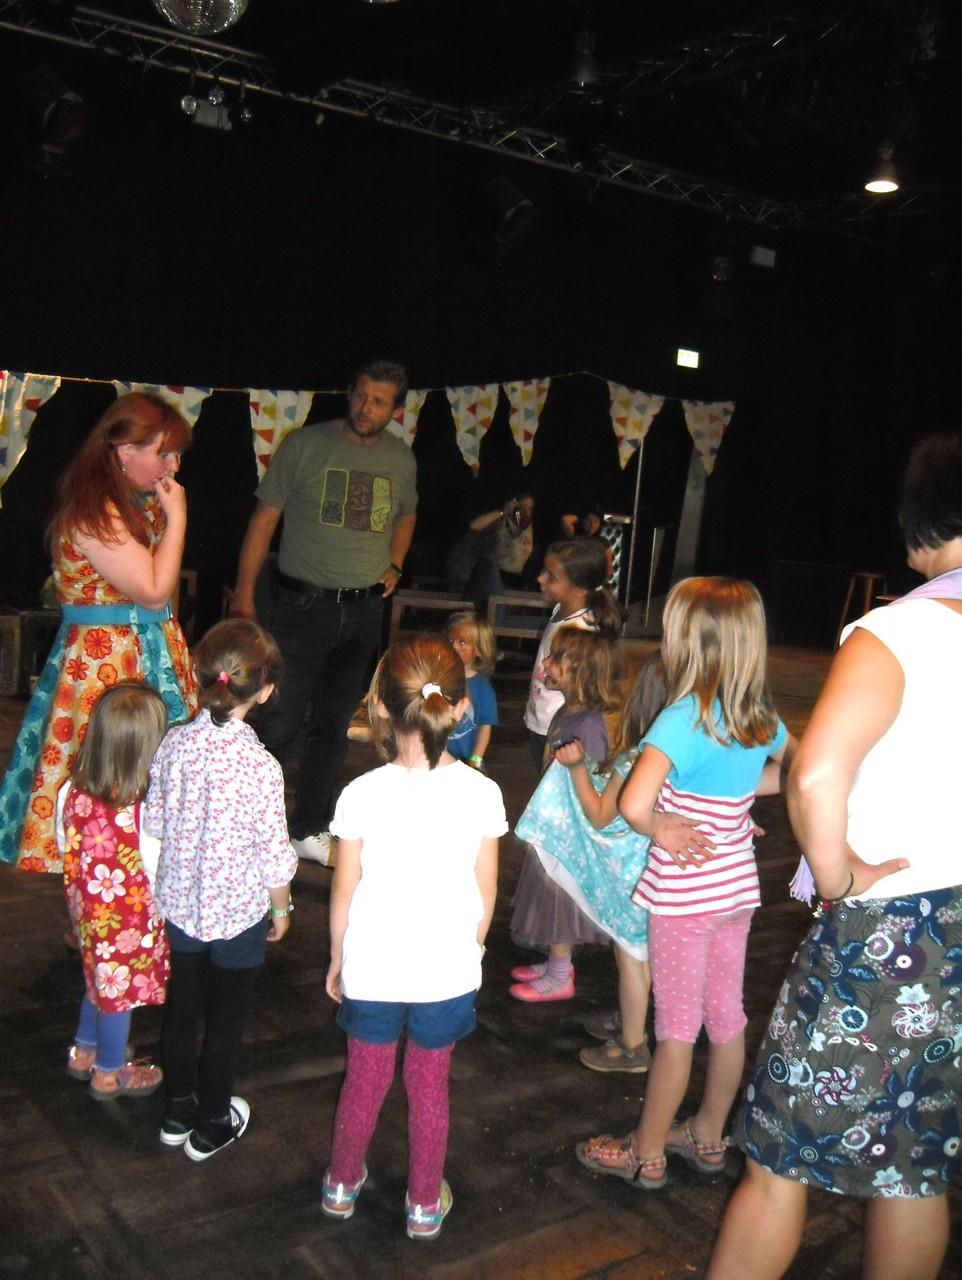 Auftritt Kinderliederfestival Trollwiese 2015 in Dresden